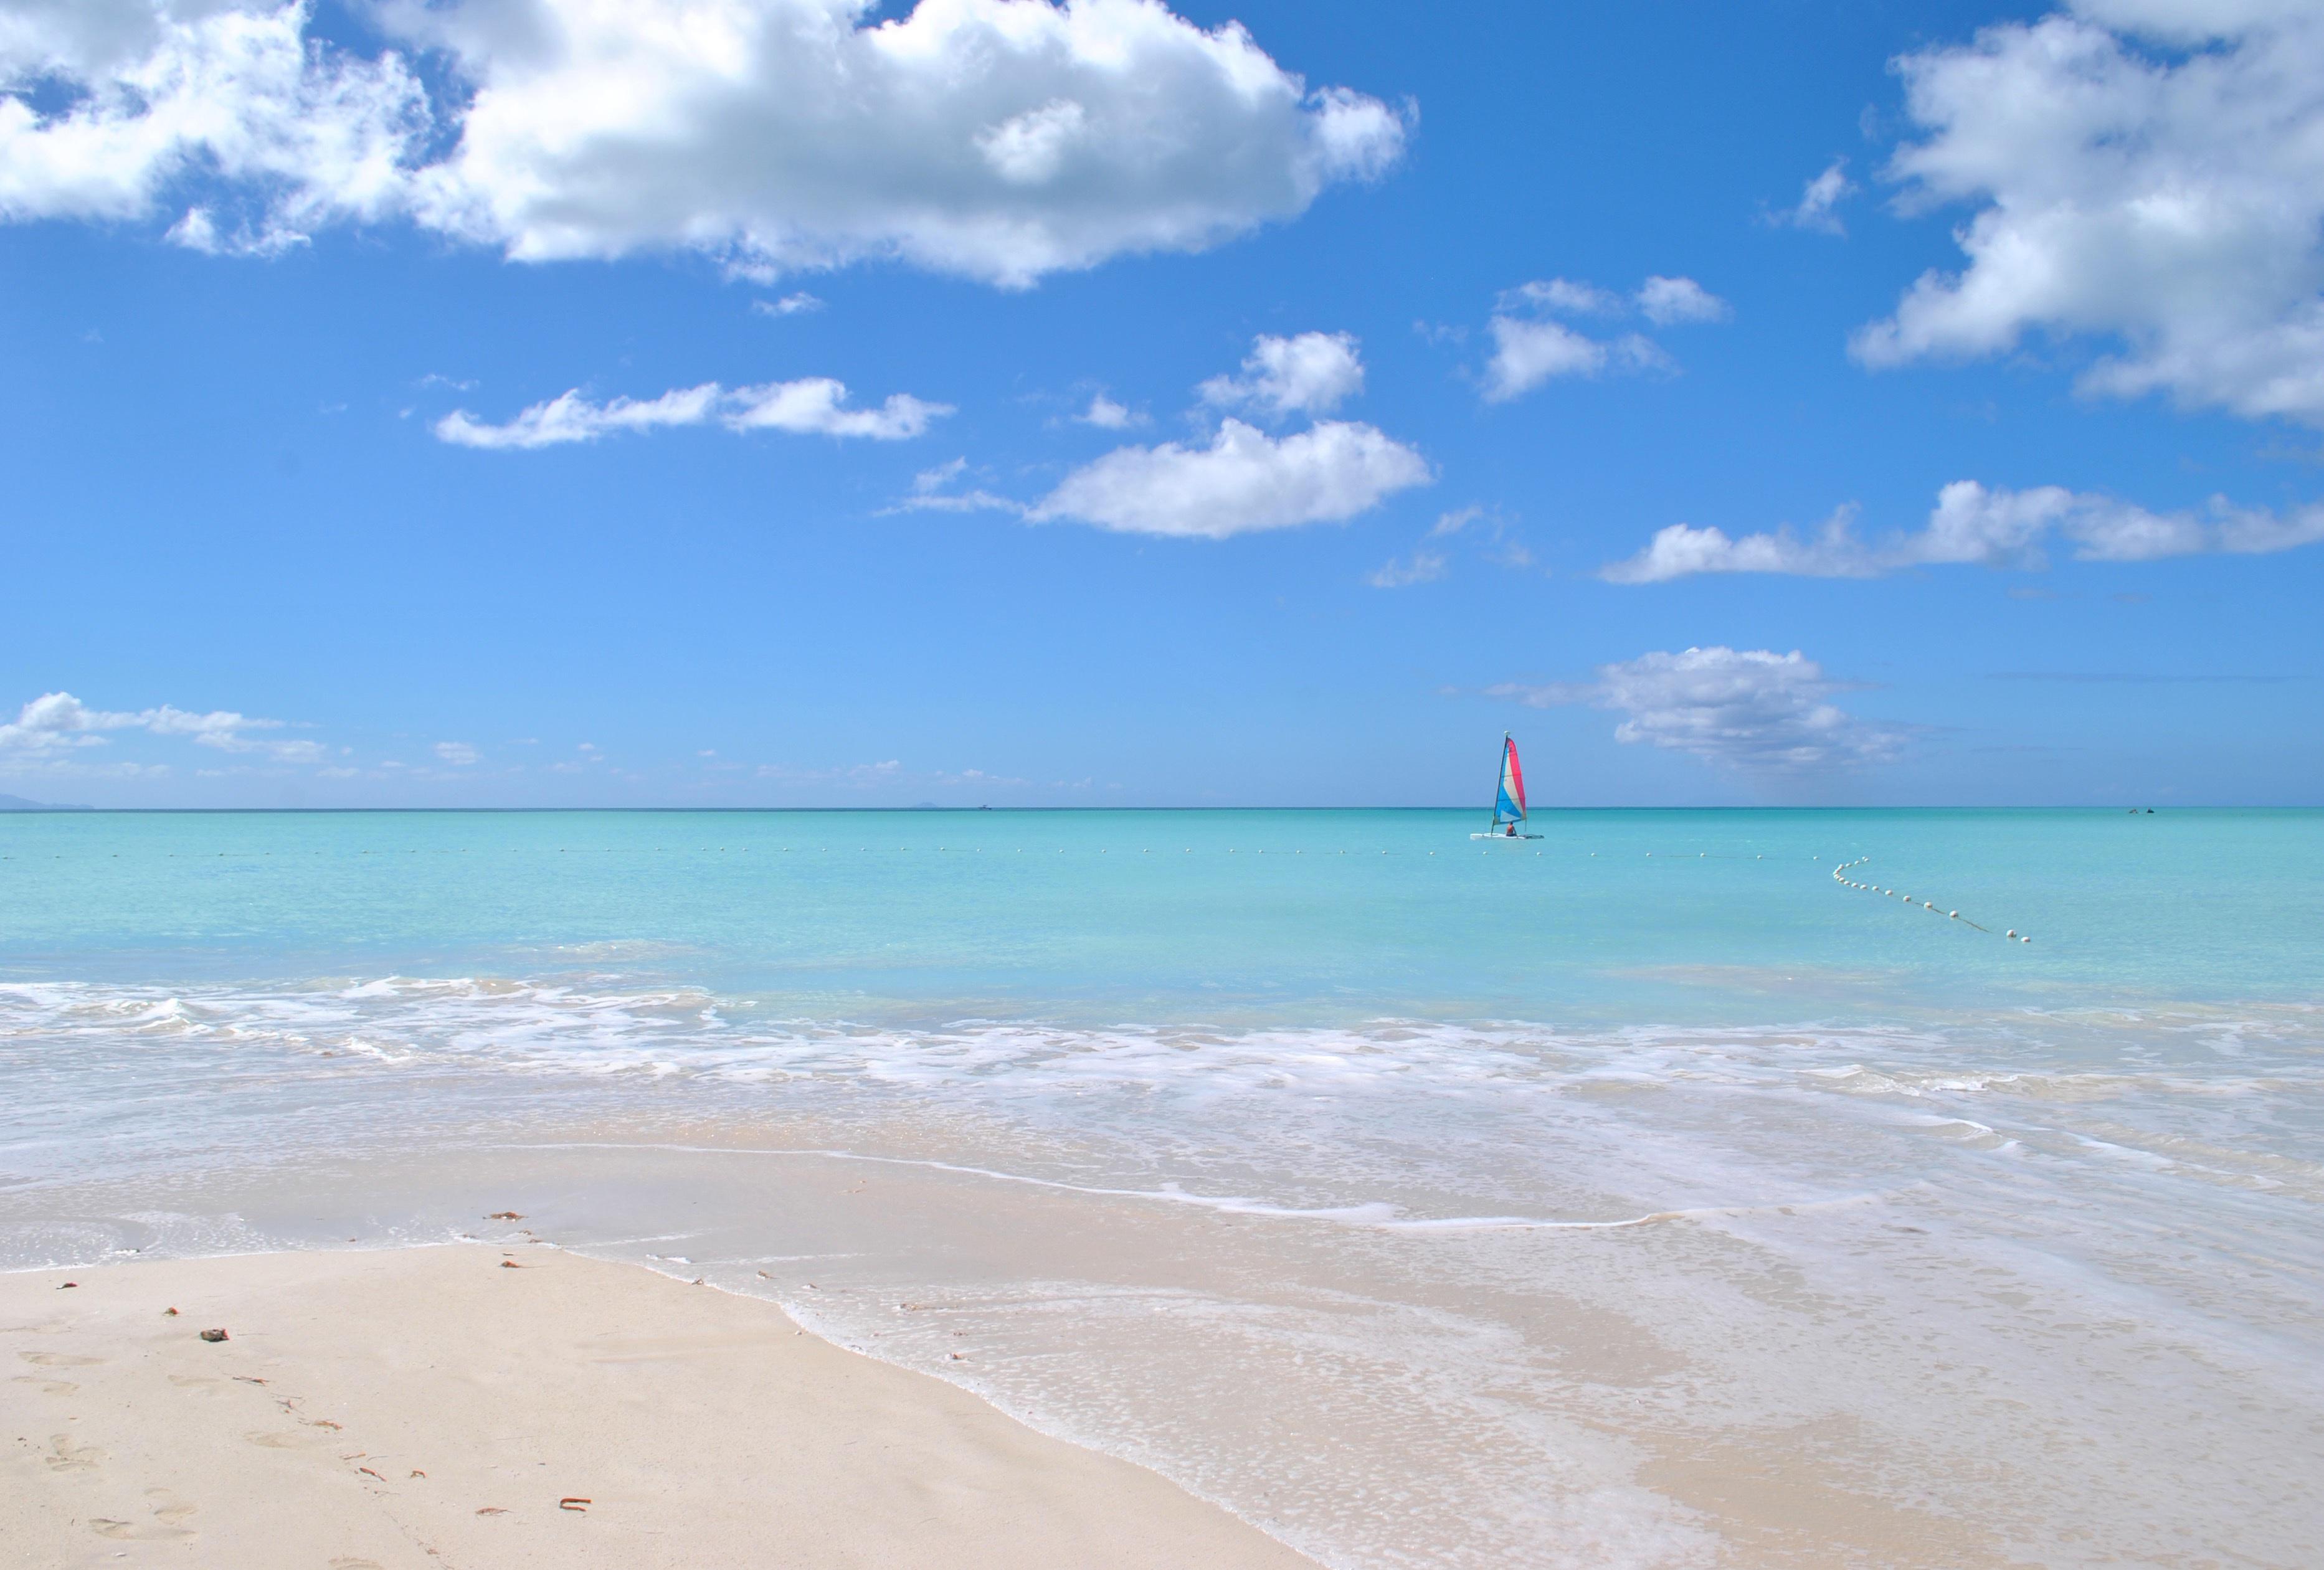 Caribbean beach pool pictures St. Croix Condo Rentals at Gentle Winds Beachfront Condos